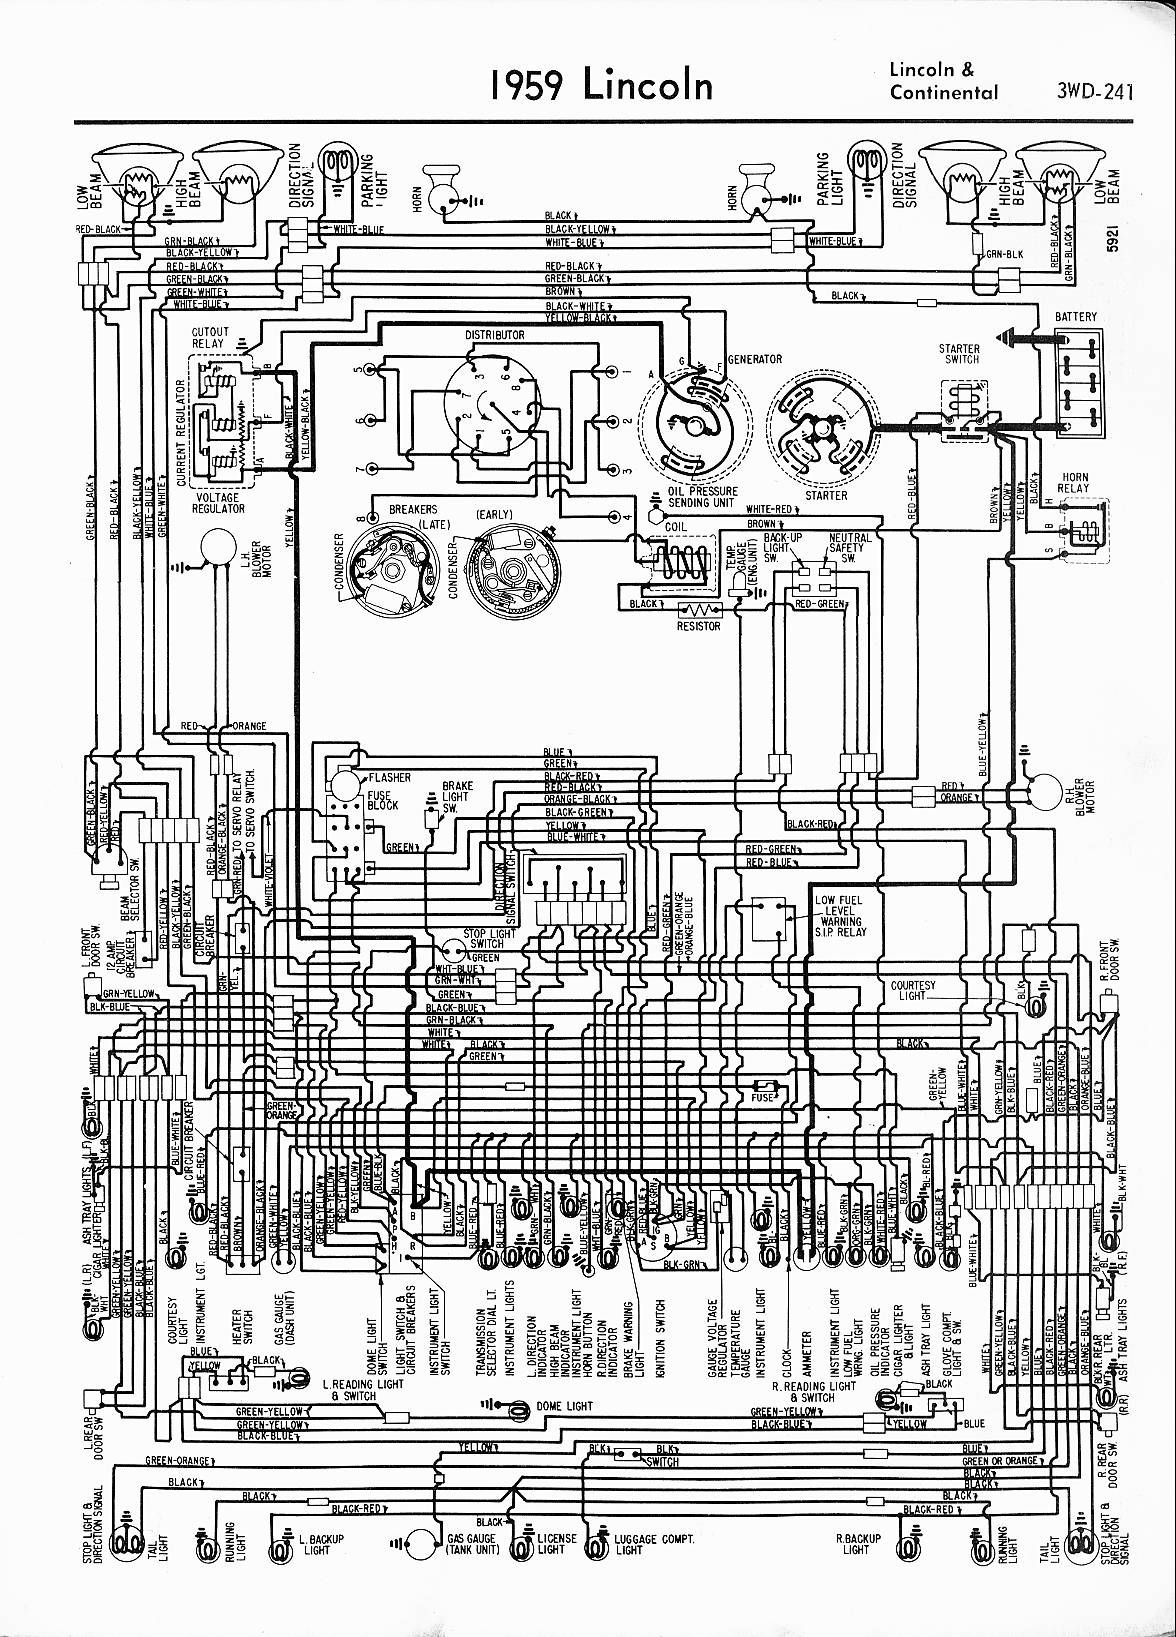 small resolution of kinetic honda wiring diagram wiring diagram diagram wire verucci wiring diagram kinetic honda wiring diagram